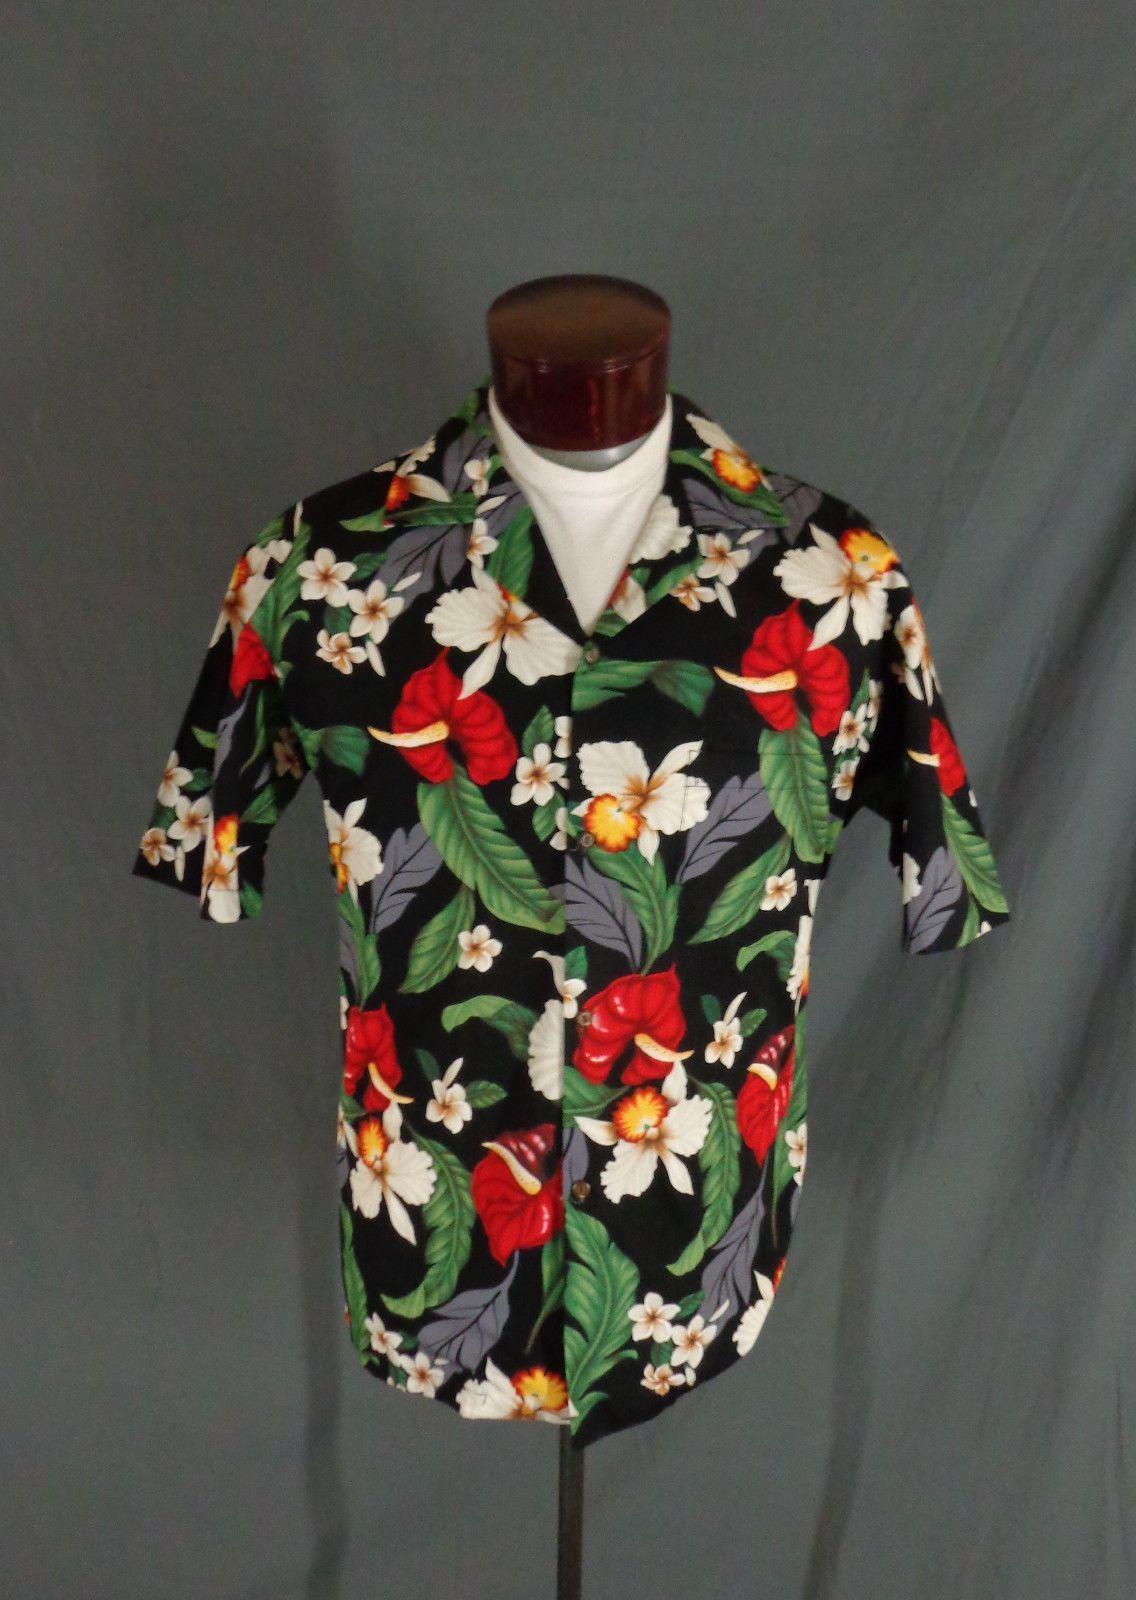 54b10df7 Vintage Aloha Republic Black Tropical Floral Print Hawaiian Shirt - Large